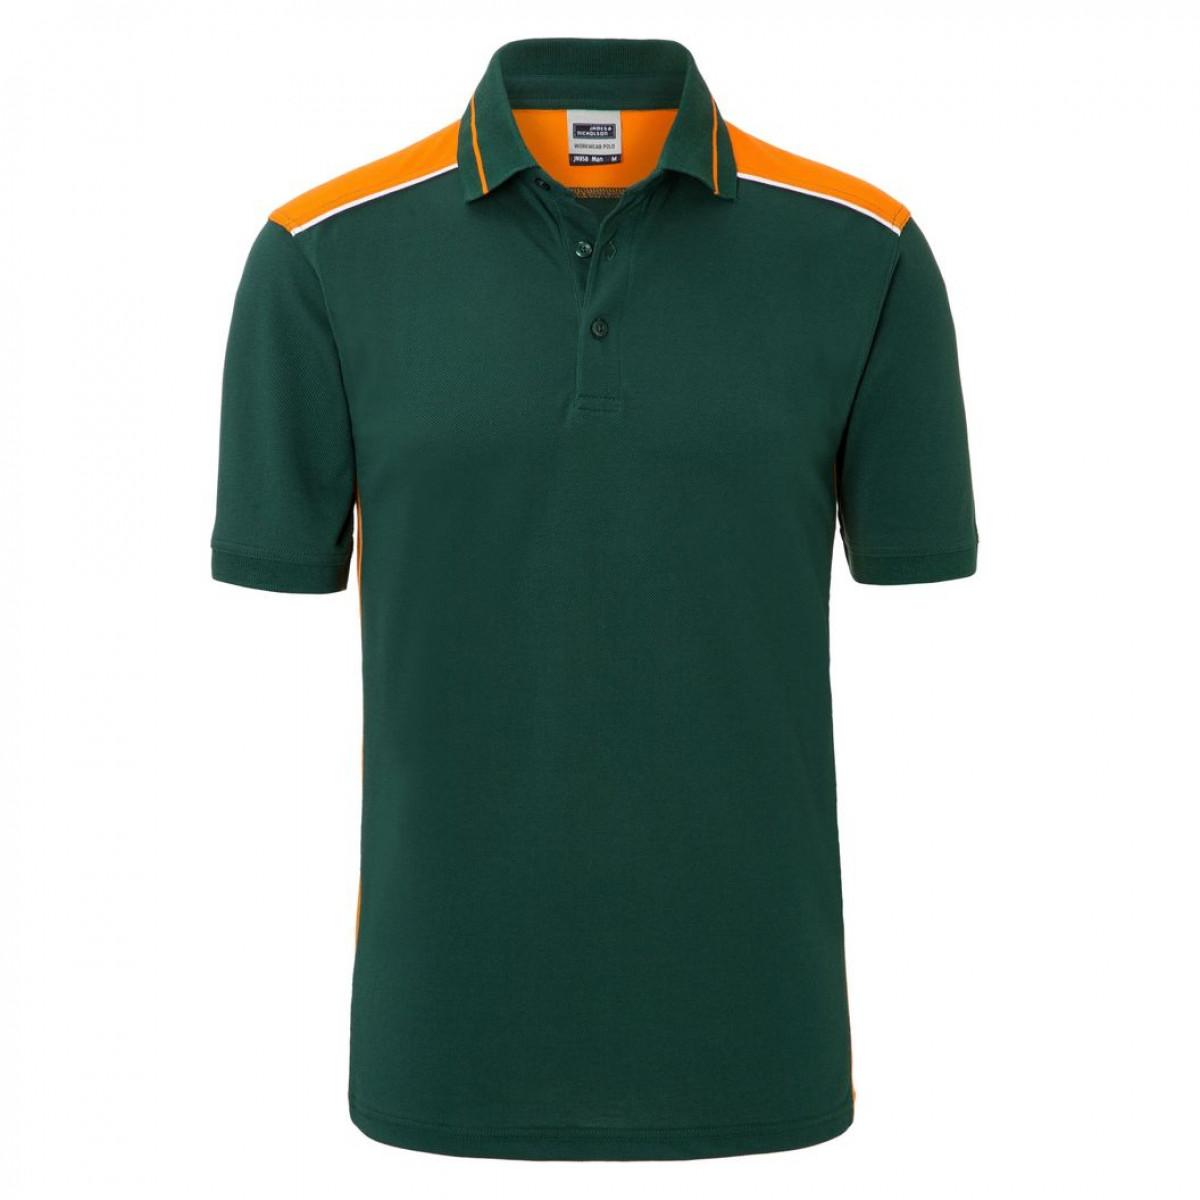 Рубашка поло мужская JN858 Mens Workwear Polo-Level 2 - Темно-зеленый/Оранжевый